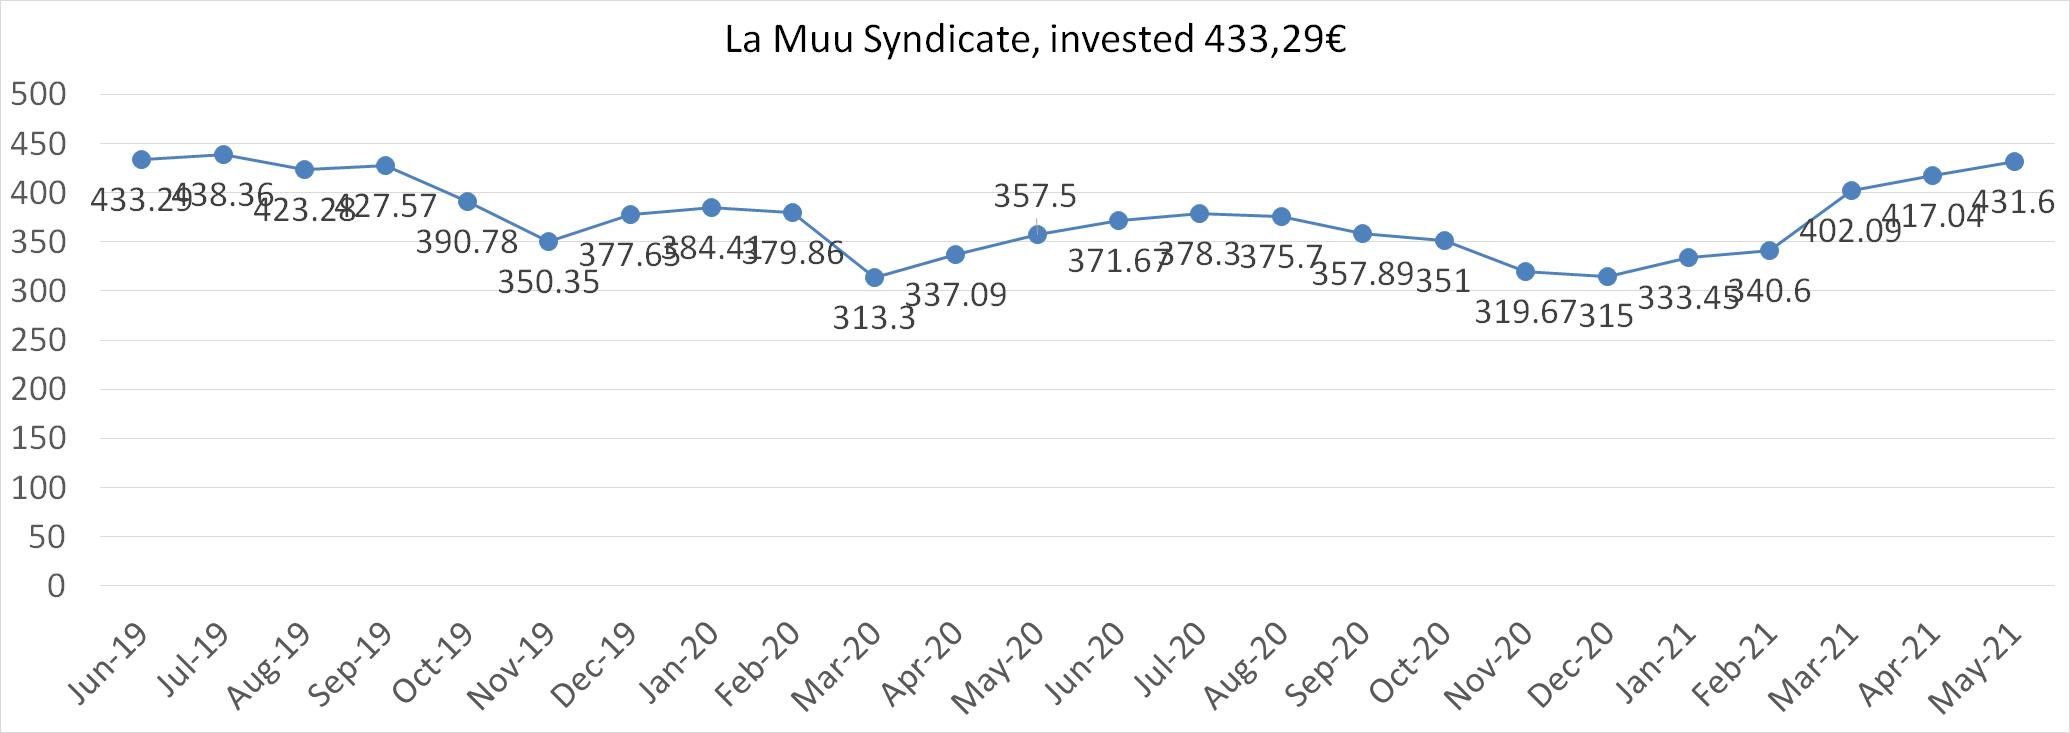 la muu syndicate worth in may 2021